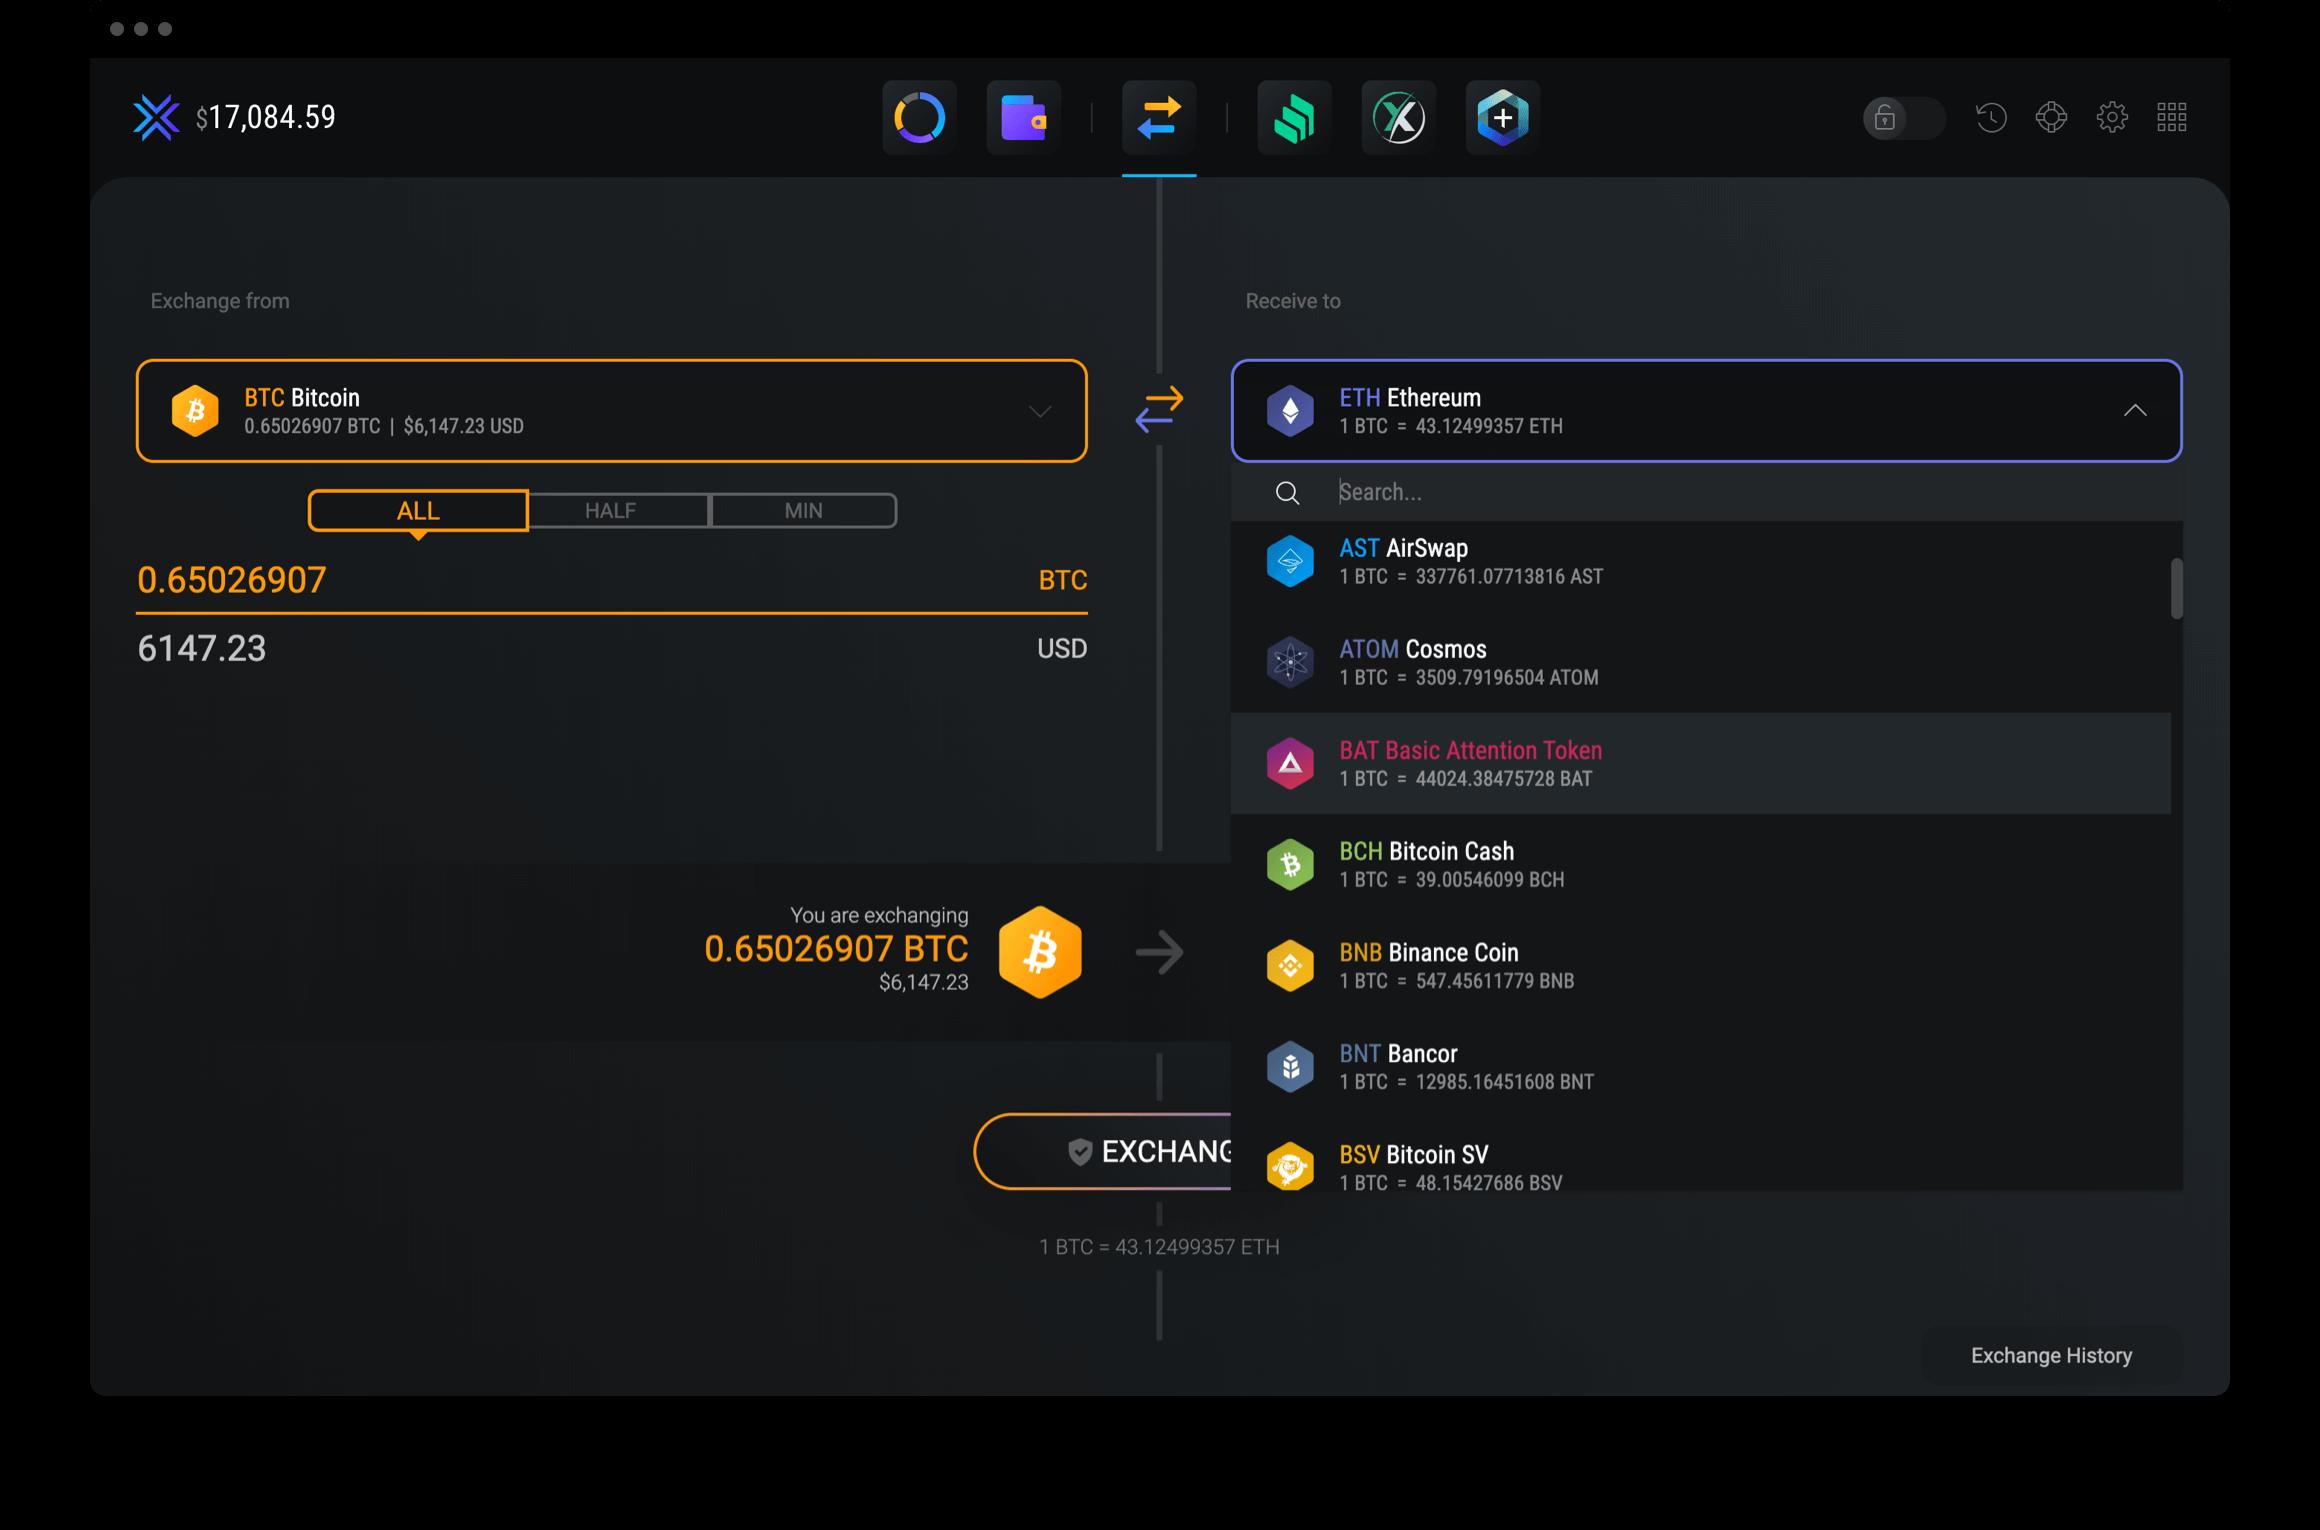 Exodus manage exchanges